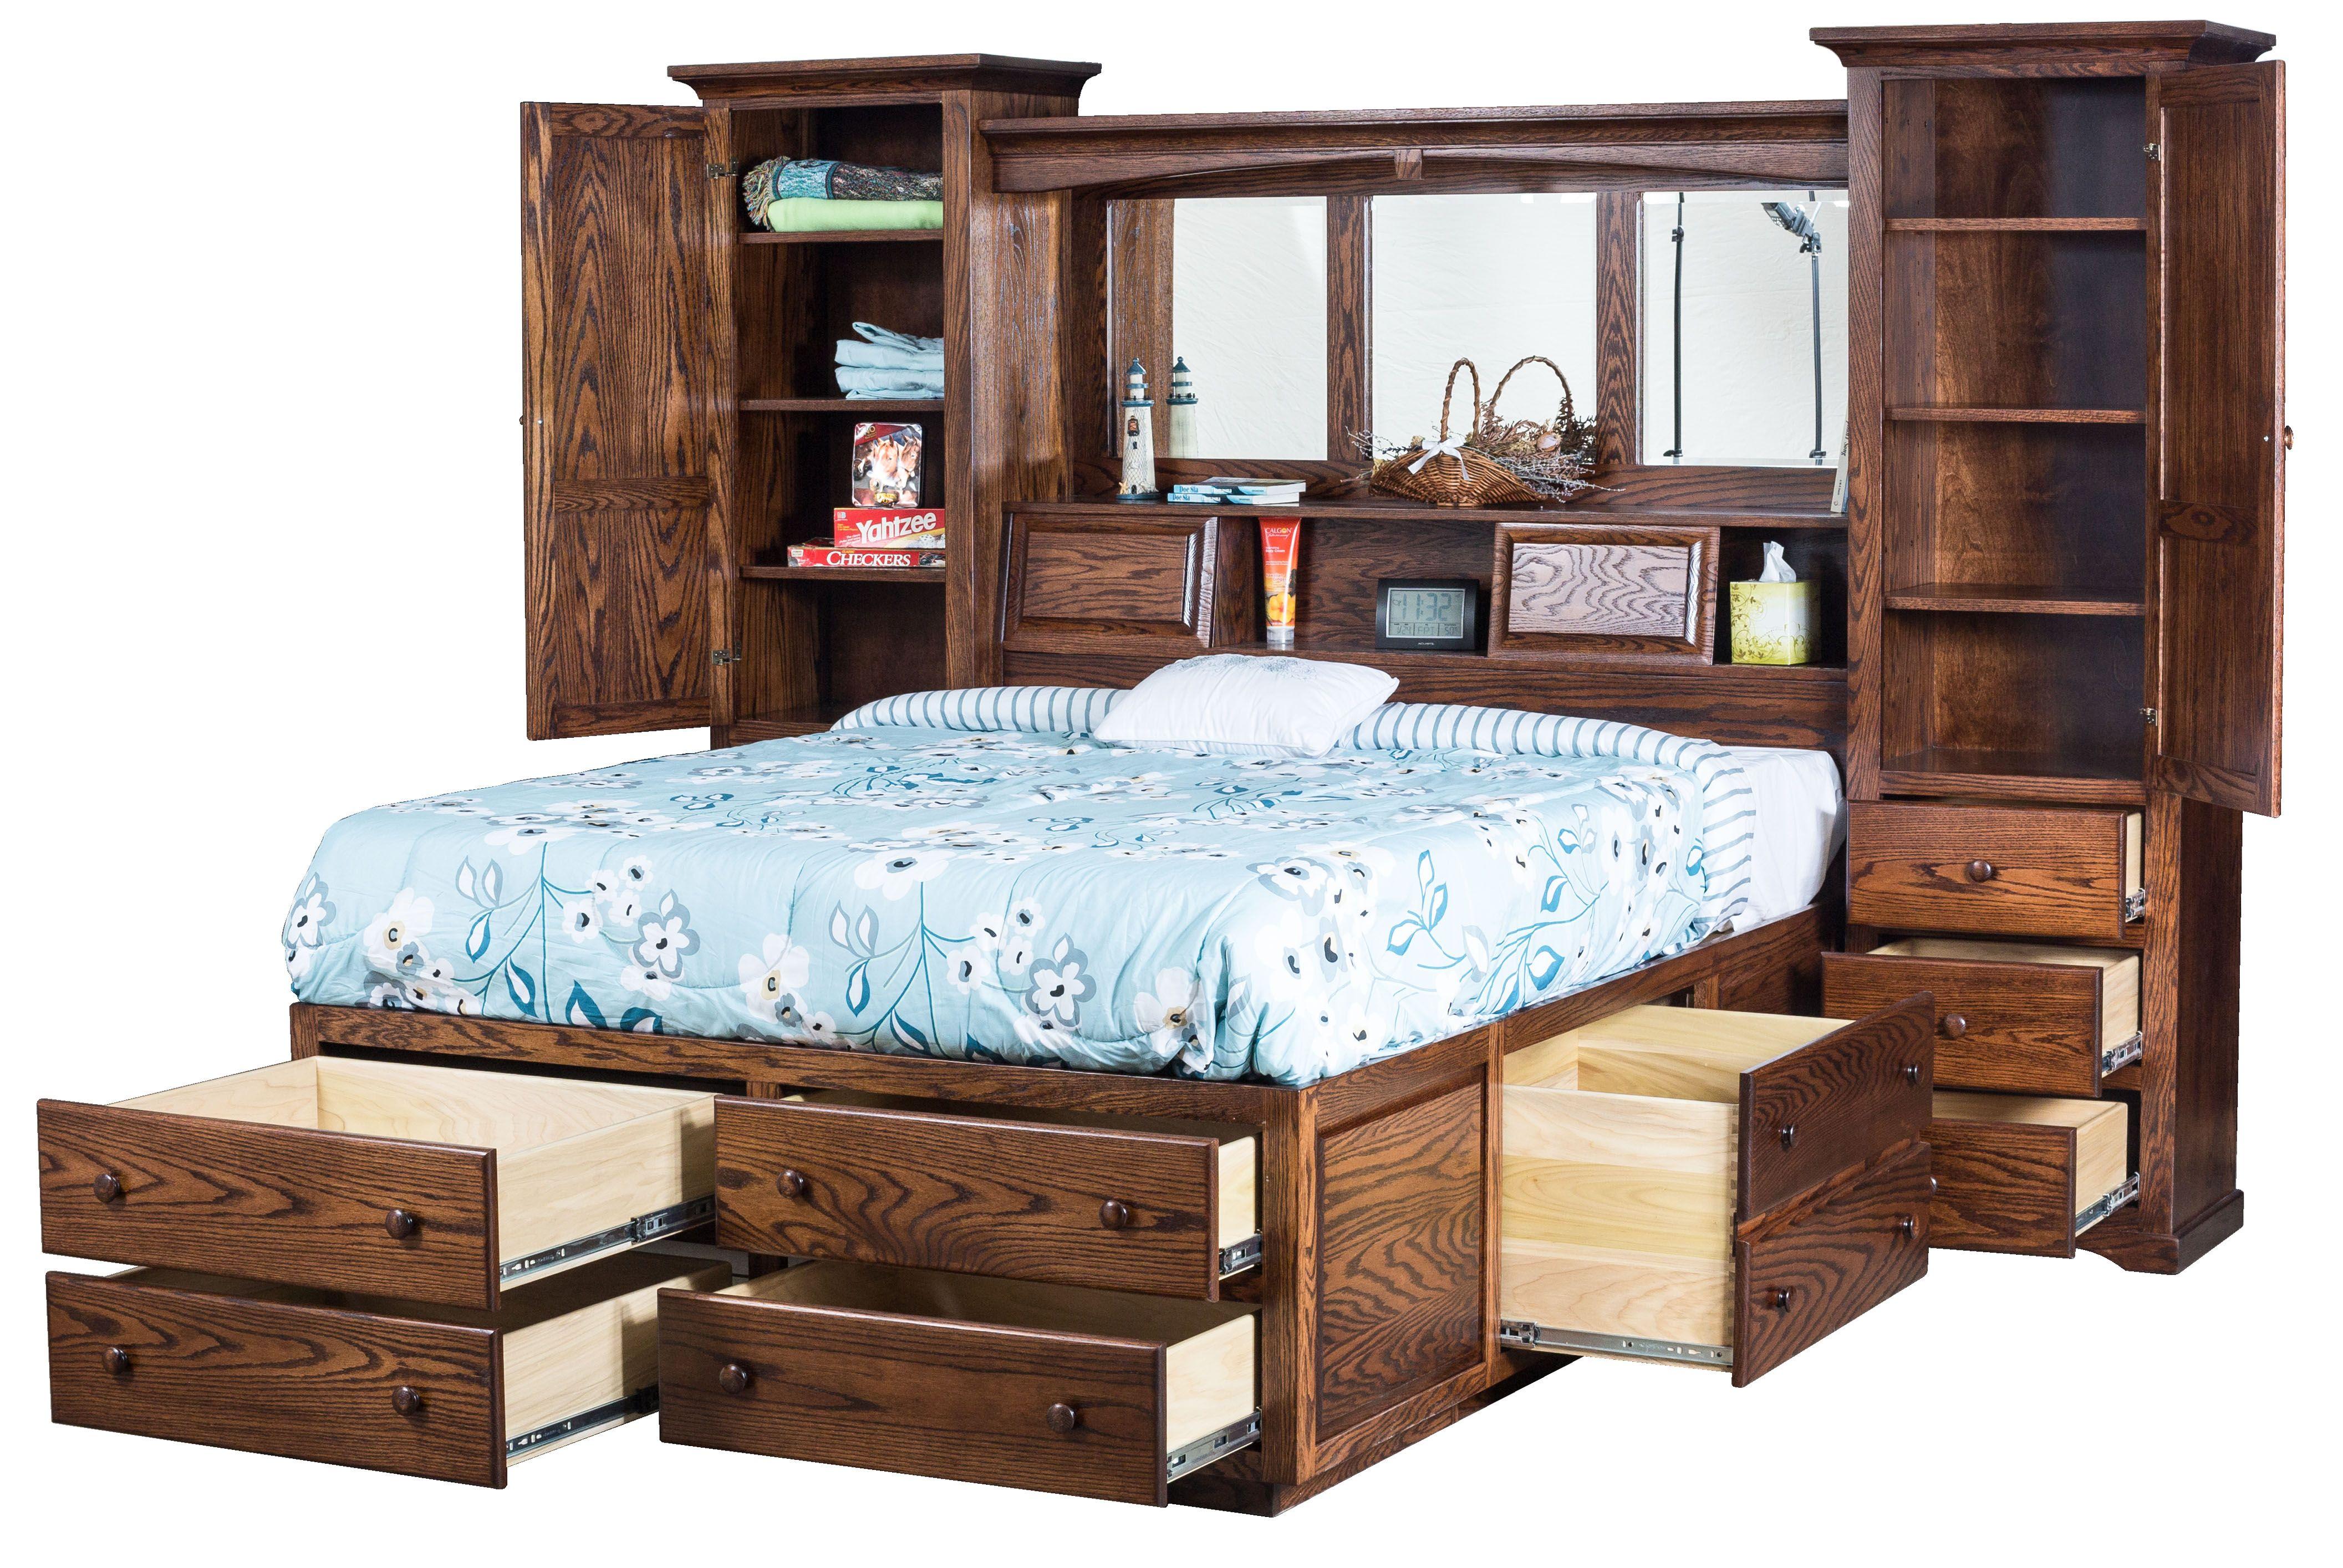 Bookcase Headboard Beds Bedroom Furniture Amish Oak in